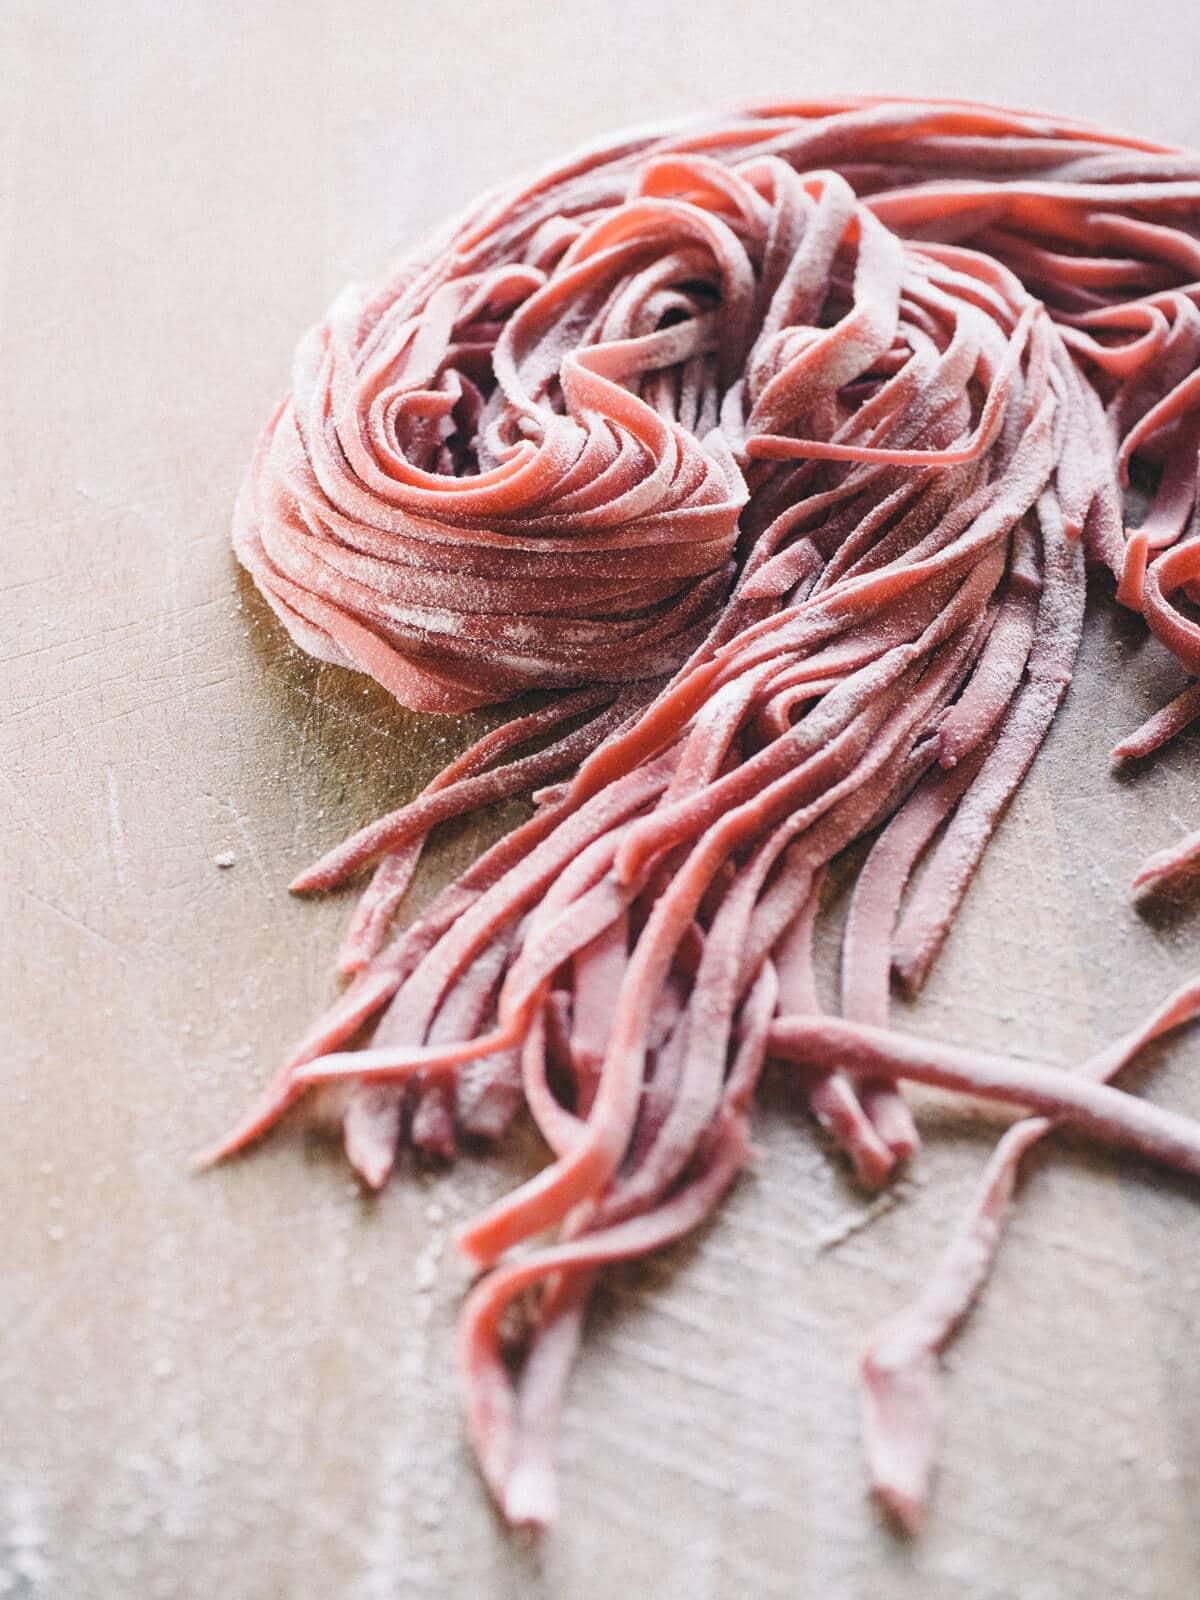 Homemade beet linguini